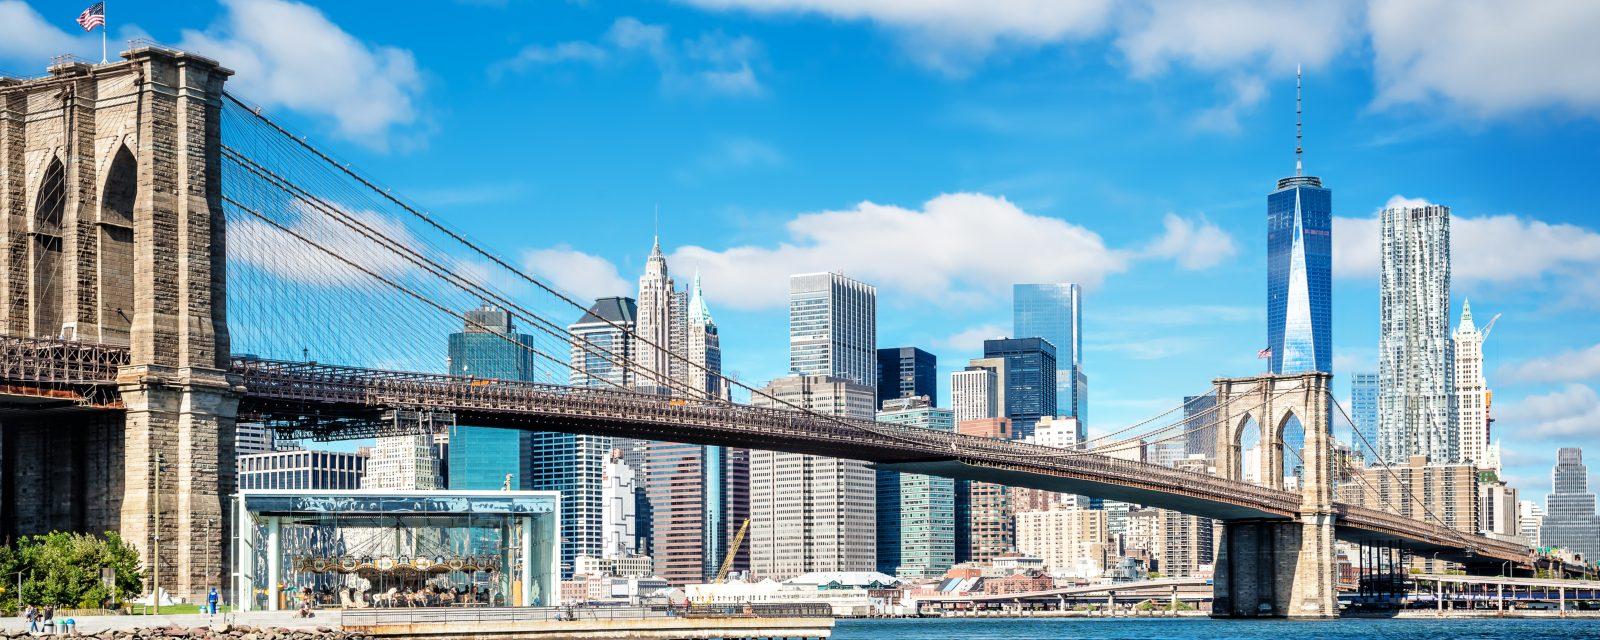 New York Hotels Luxus Resorts